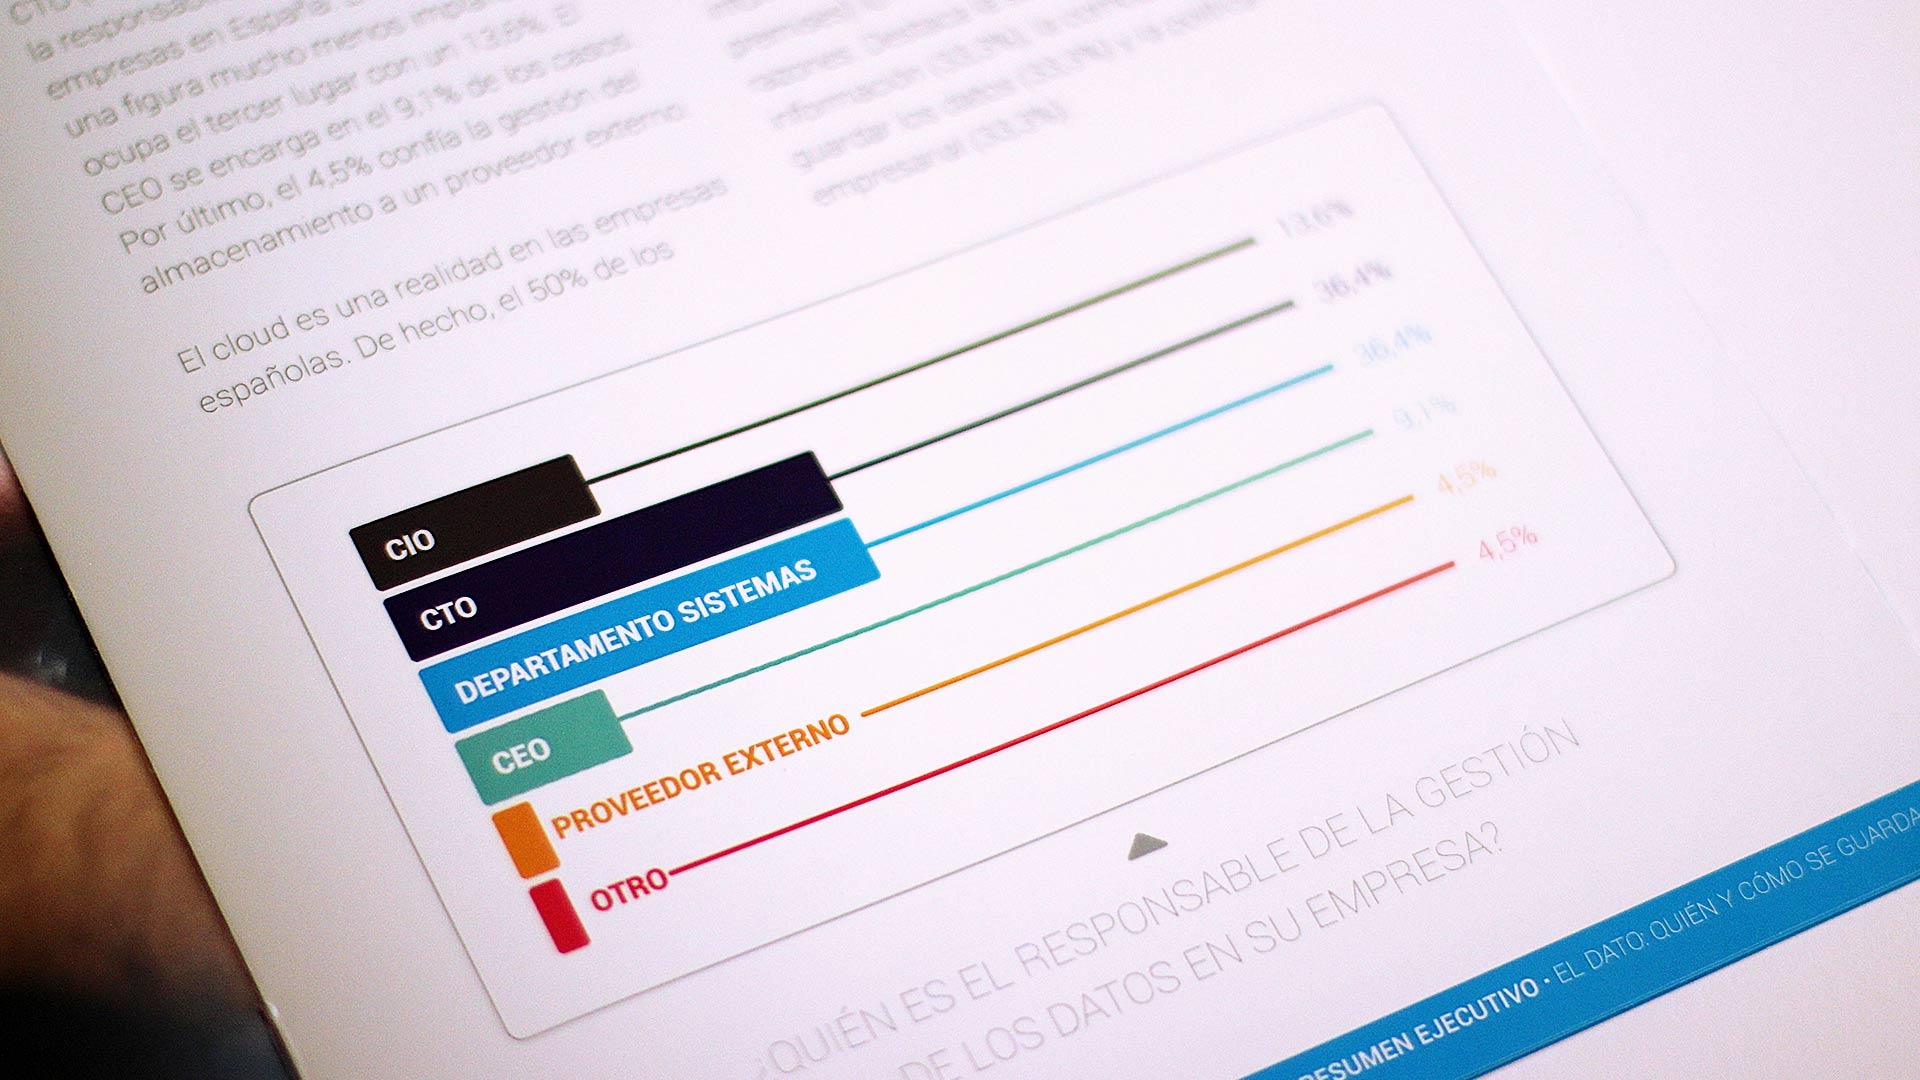 netapp-mediacloud-content-marketing-informe-resumen-ejecutivo-ebook-2017-12